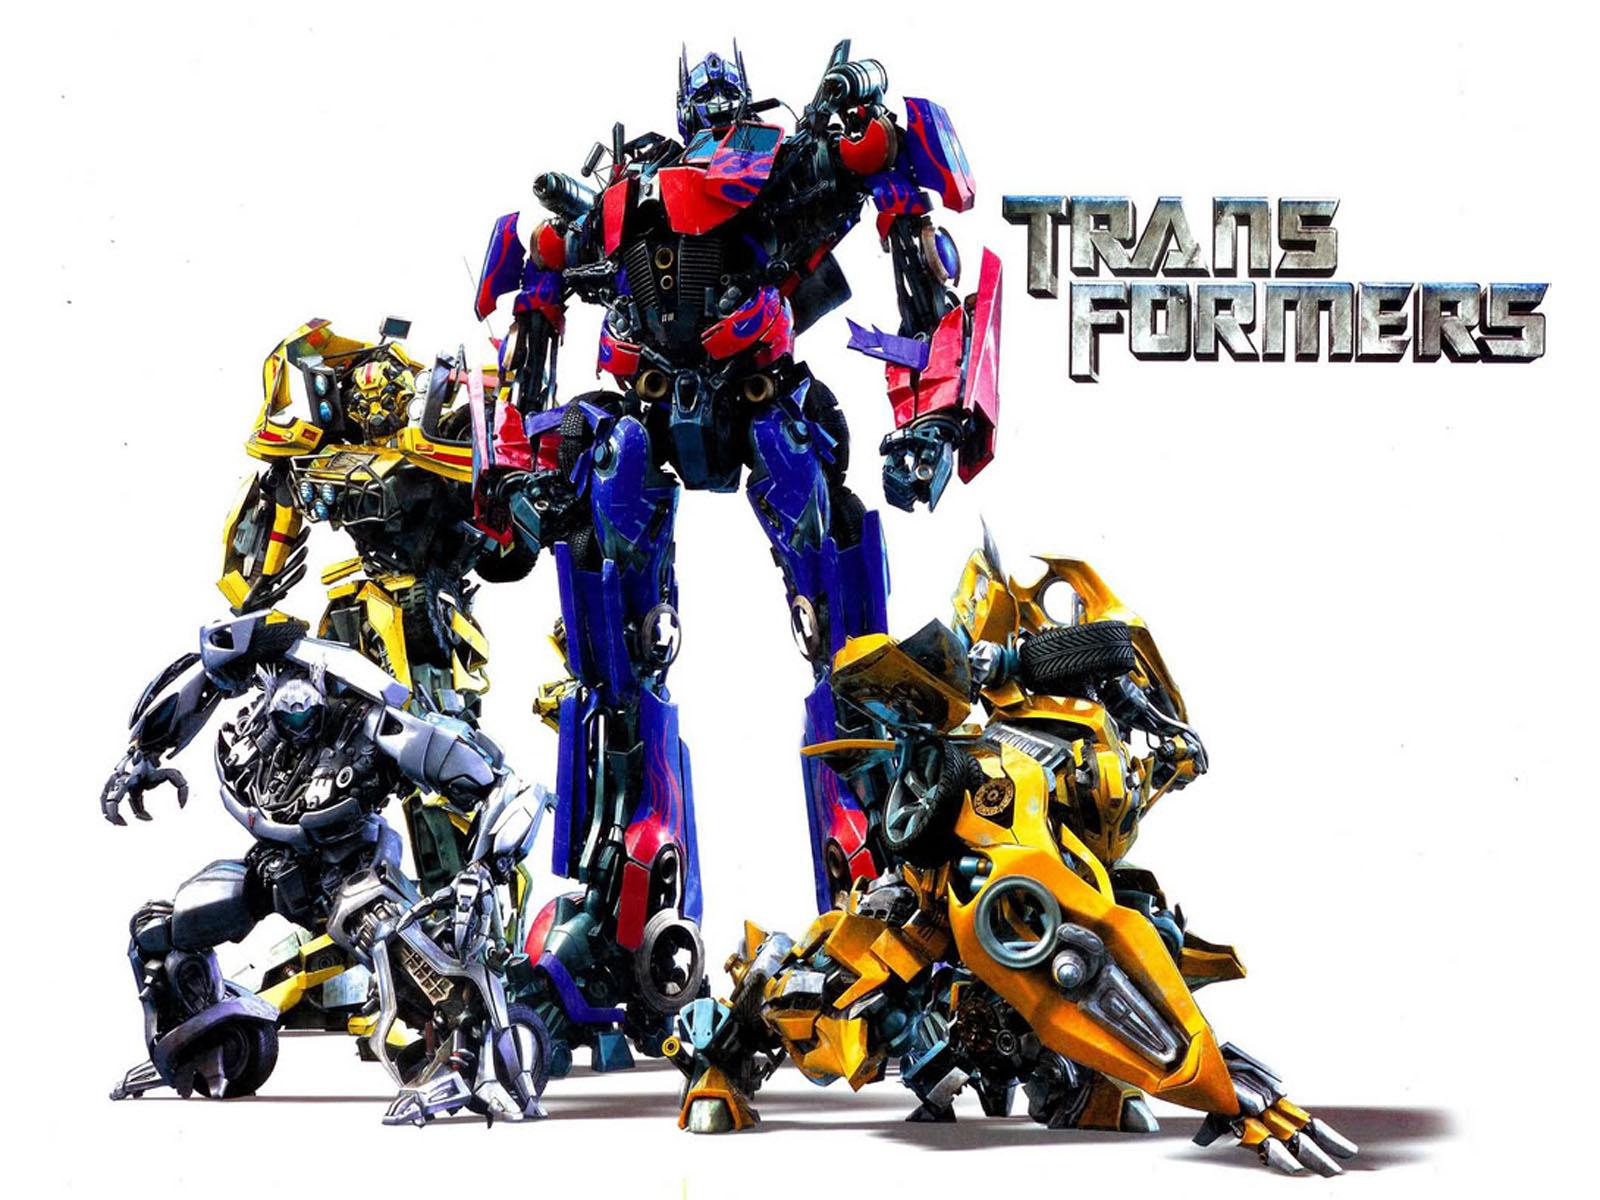 69 Transformers Wallpaper Hd On Wallpapersafari